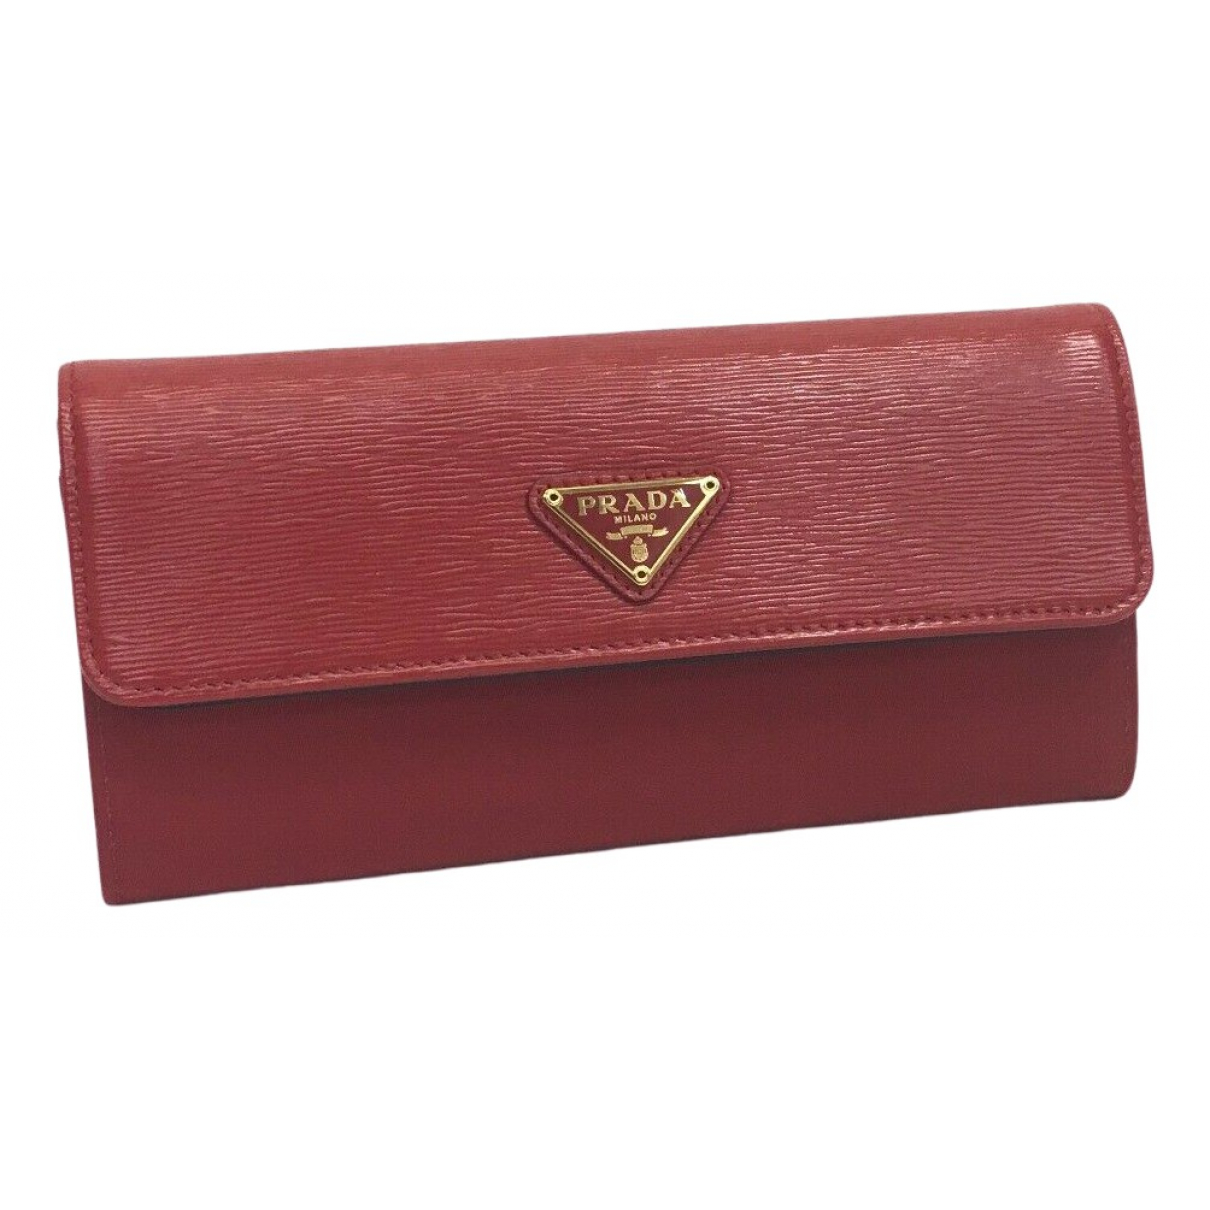 Prada N Leather Purses, wallet & cases for Women N